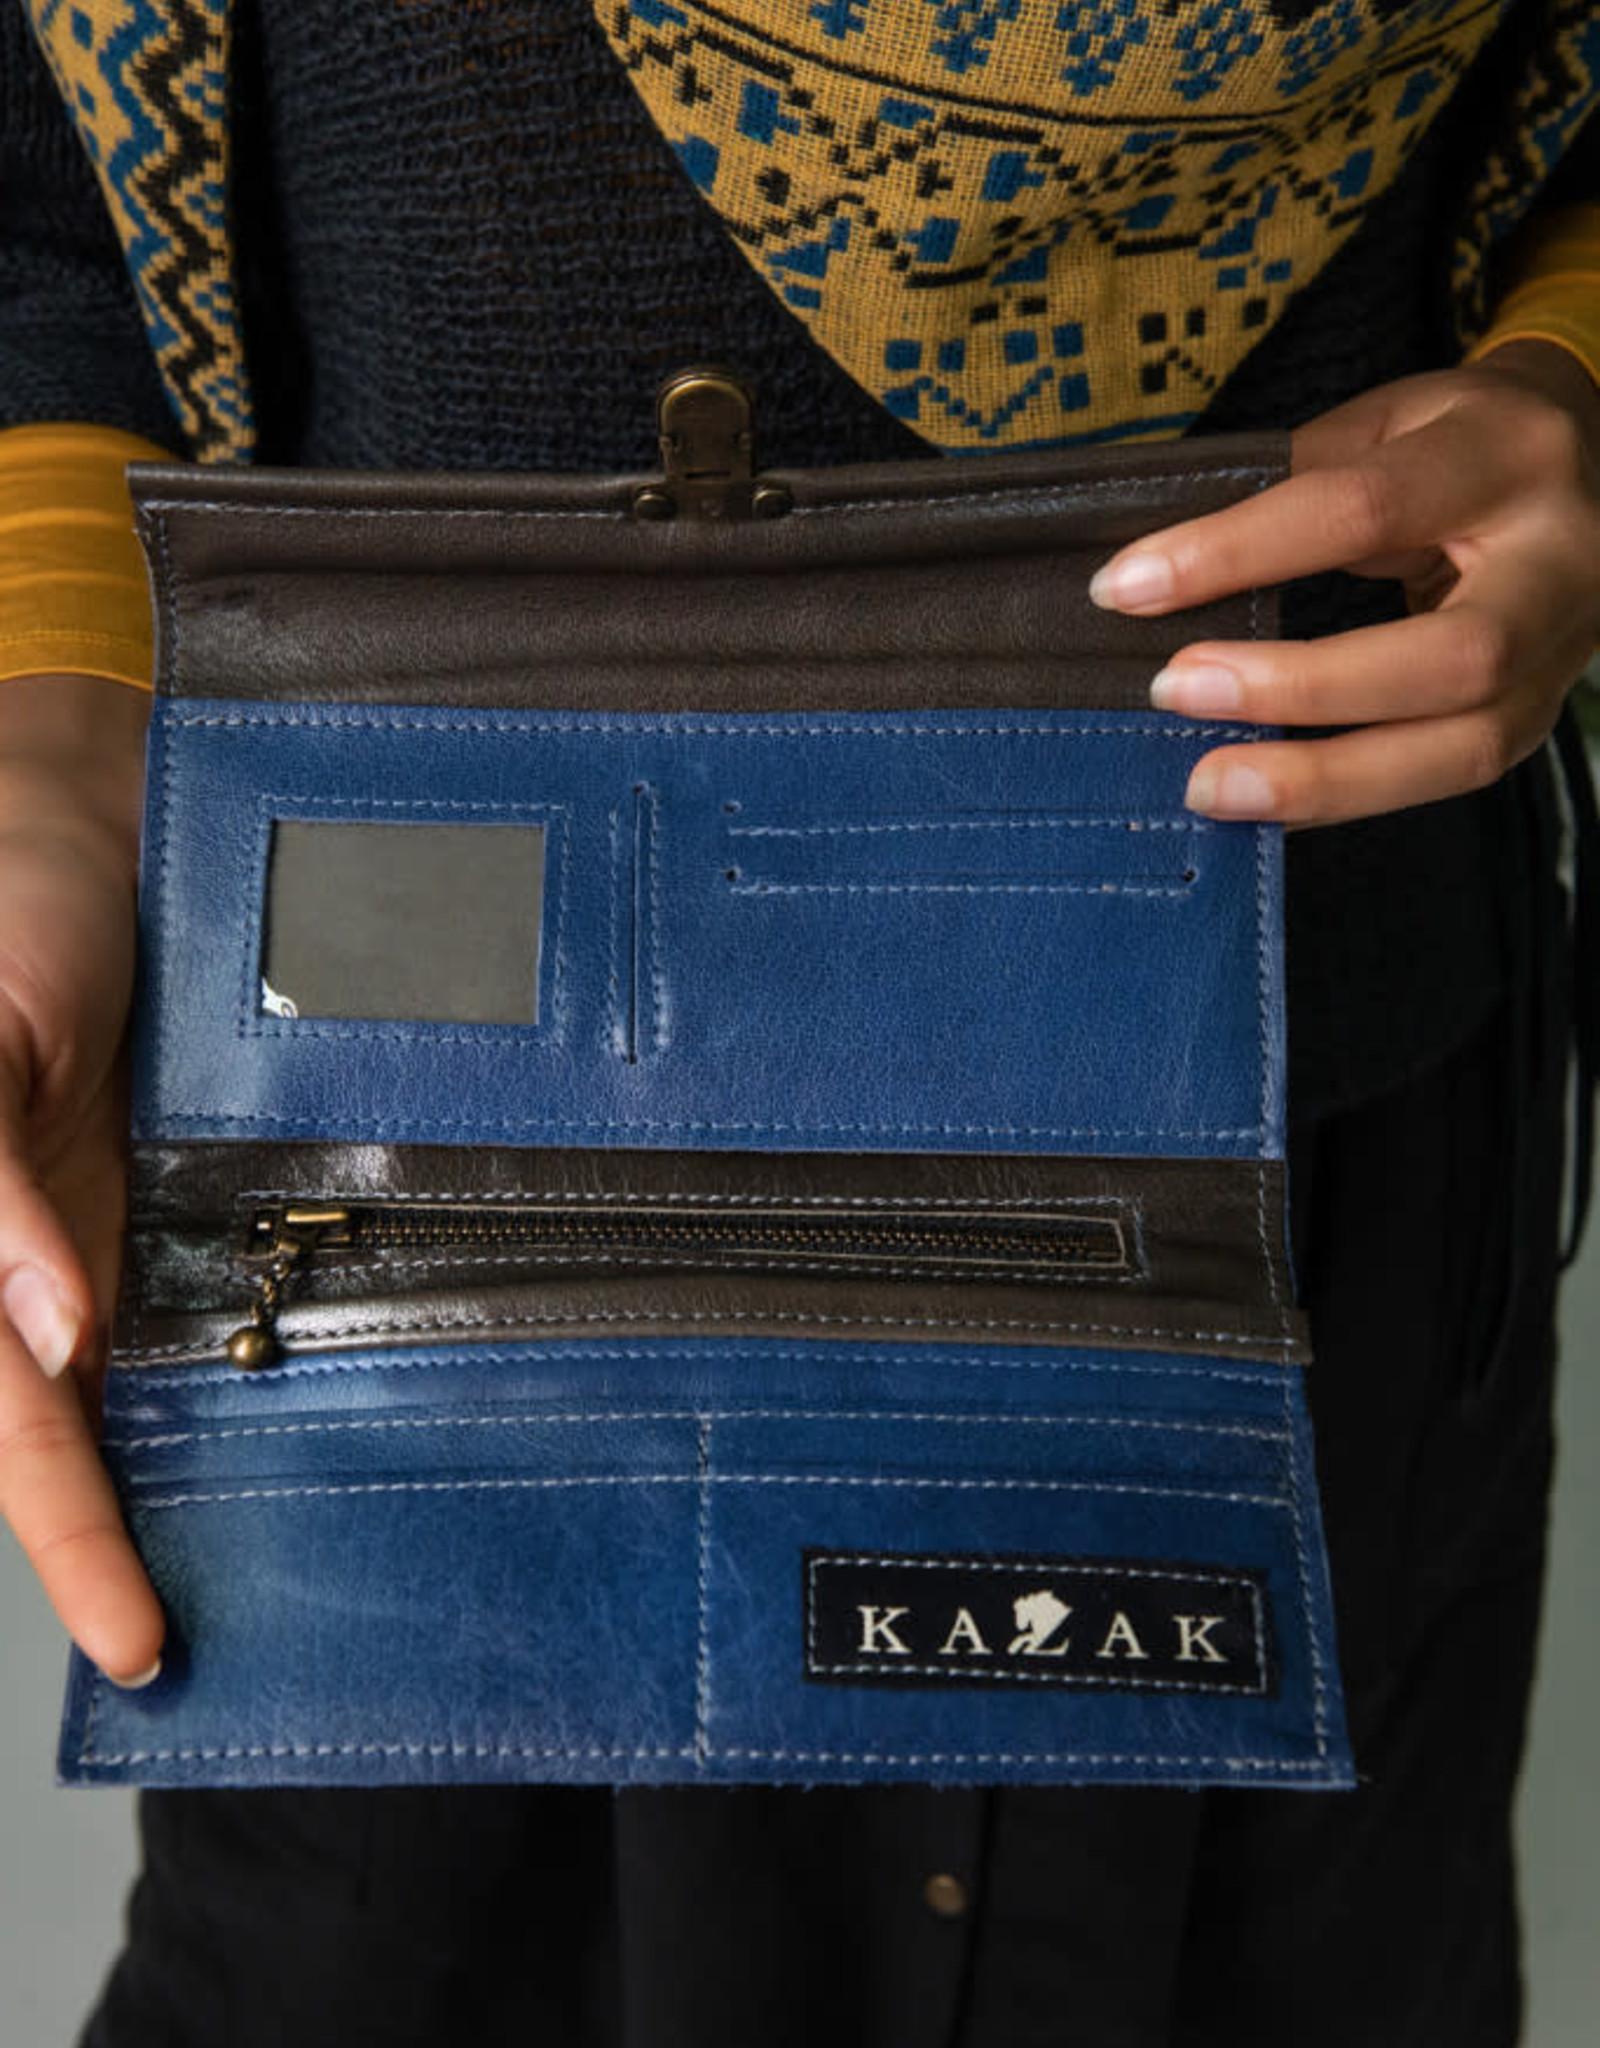 Kazak Porte Feuille Josephine PE19 Kazak Bleu/Taupe